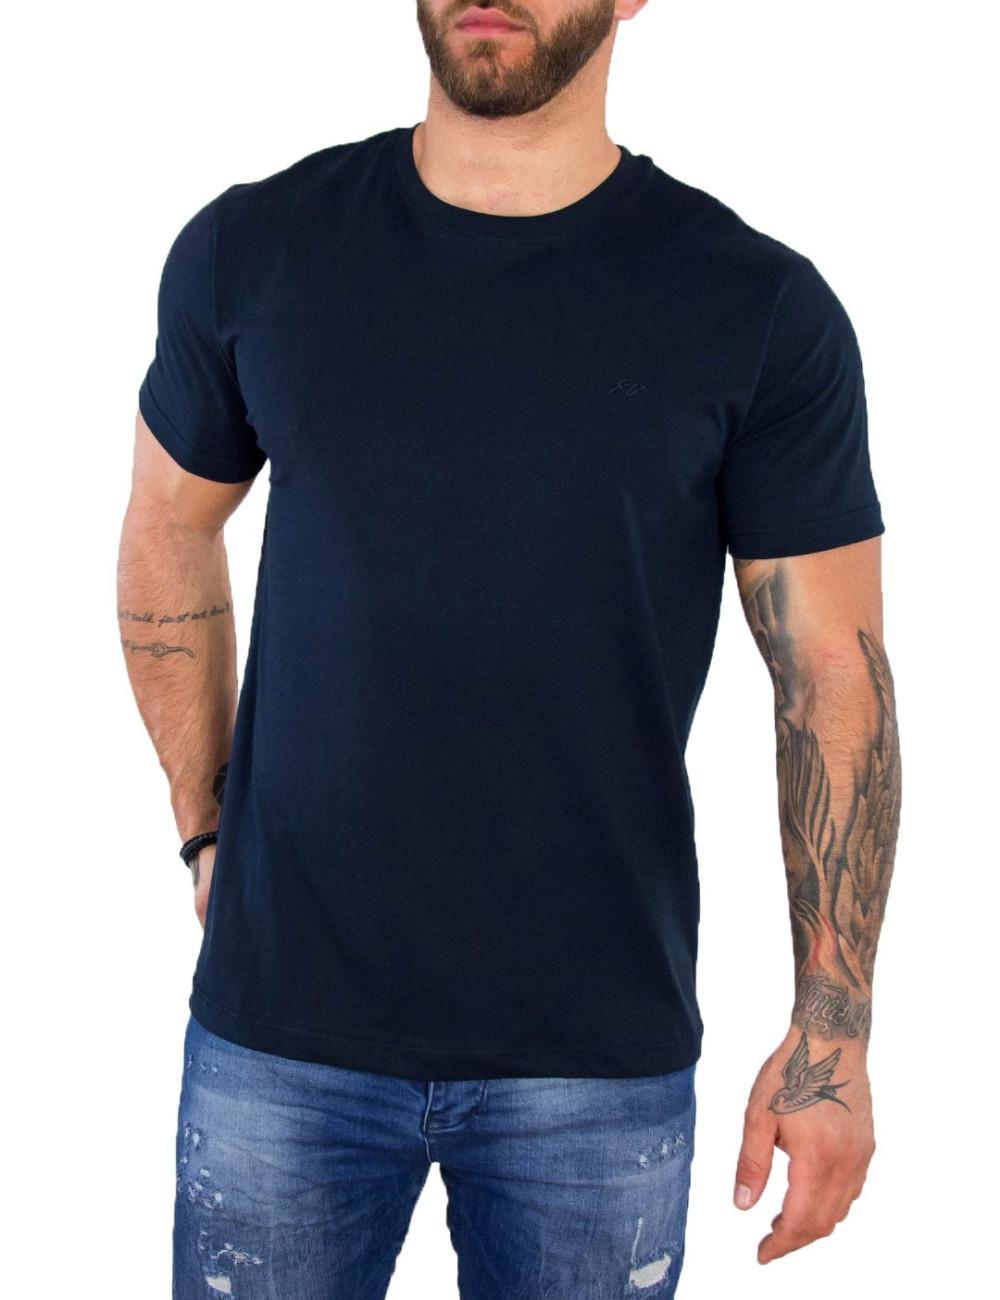 Everbest ανδρικό μπλε Plus Size Tshirt 212800F